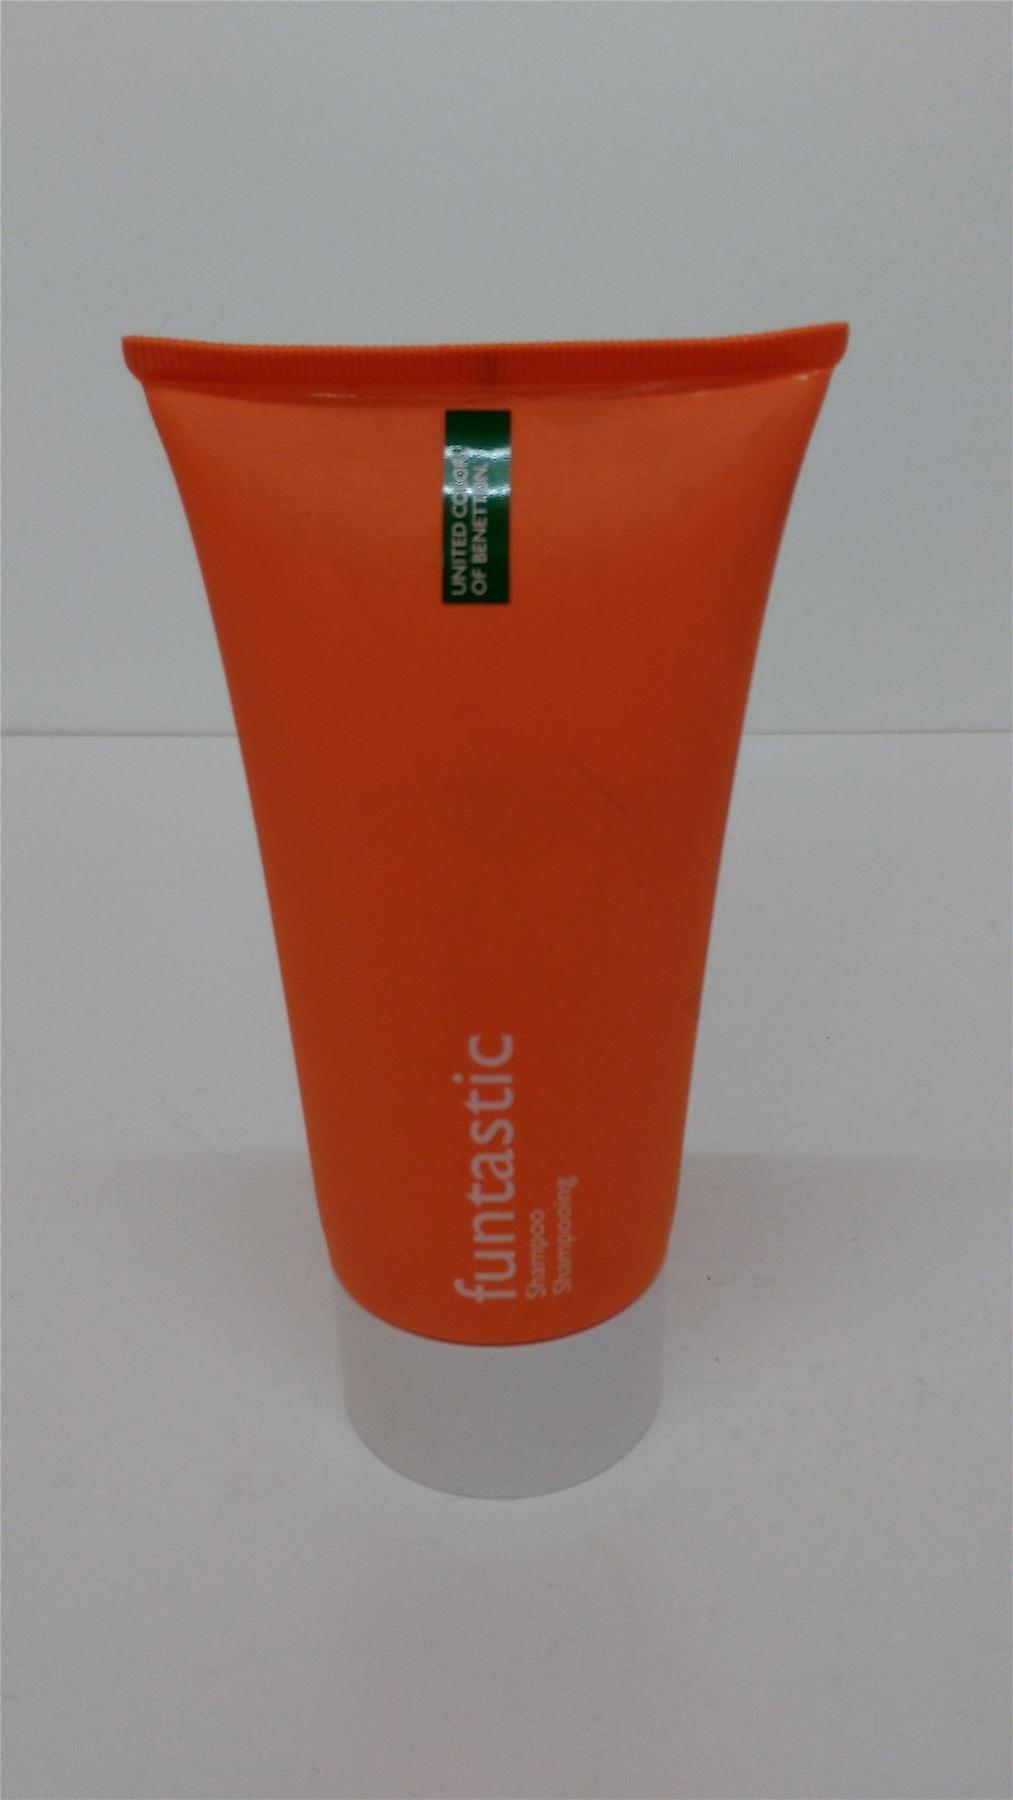 Benetton Funtastic Shampoo TRIPLE PACK 3 x 150ml/5fl oz [O]